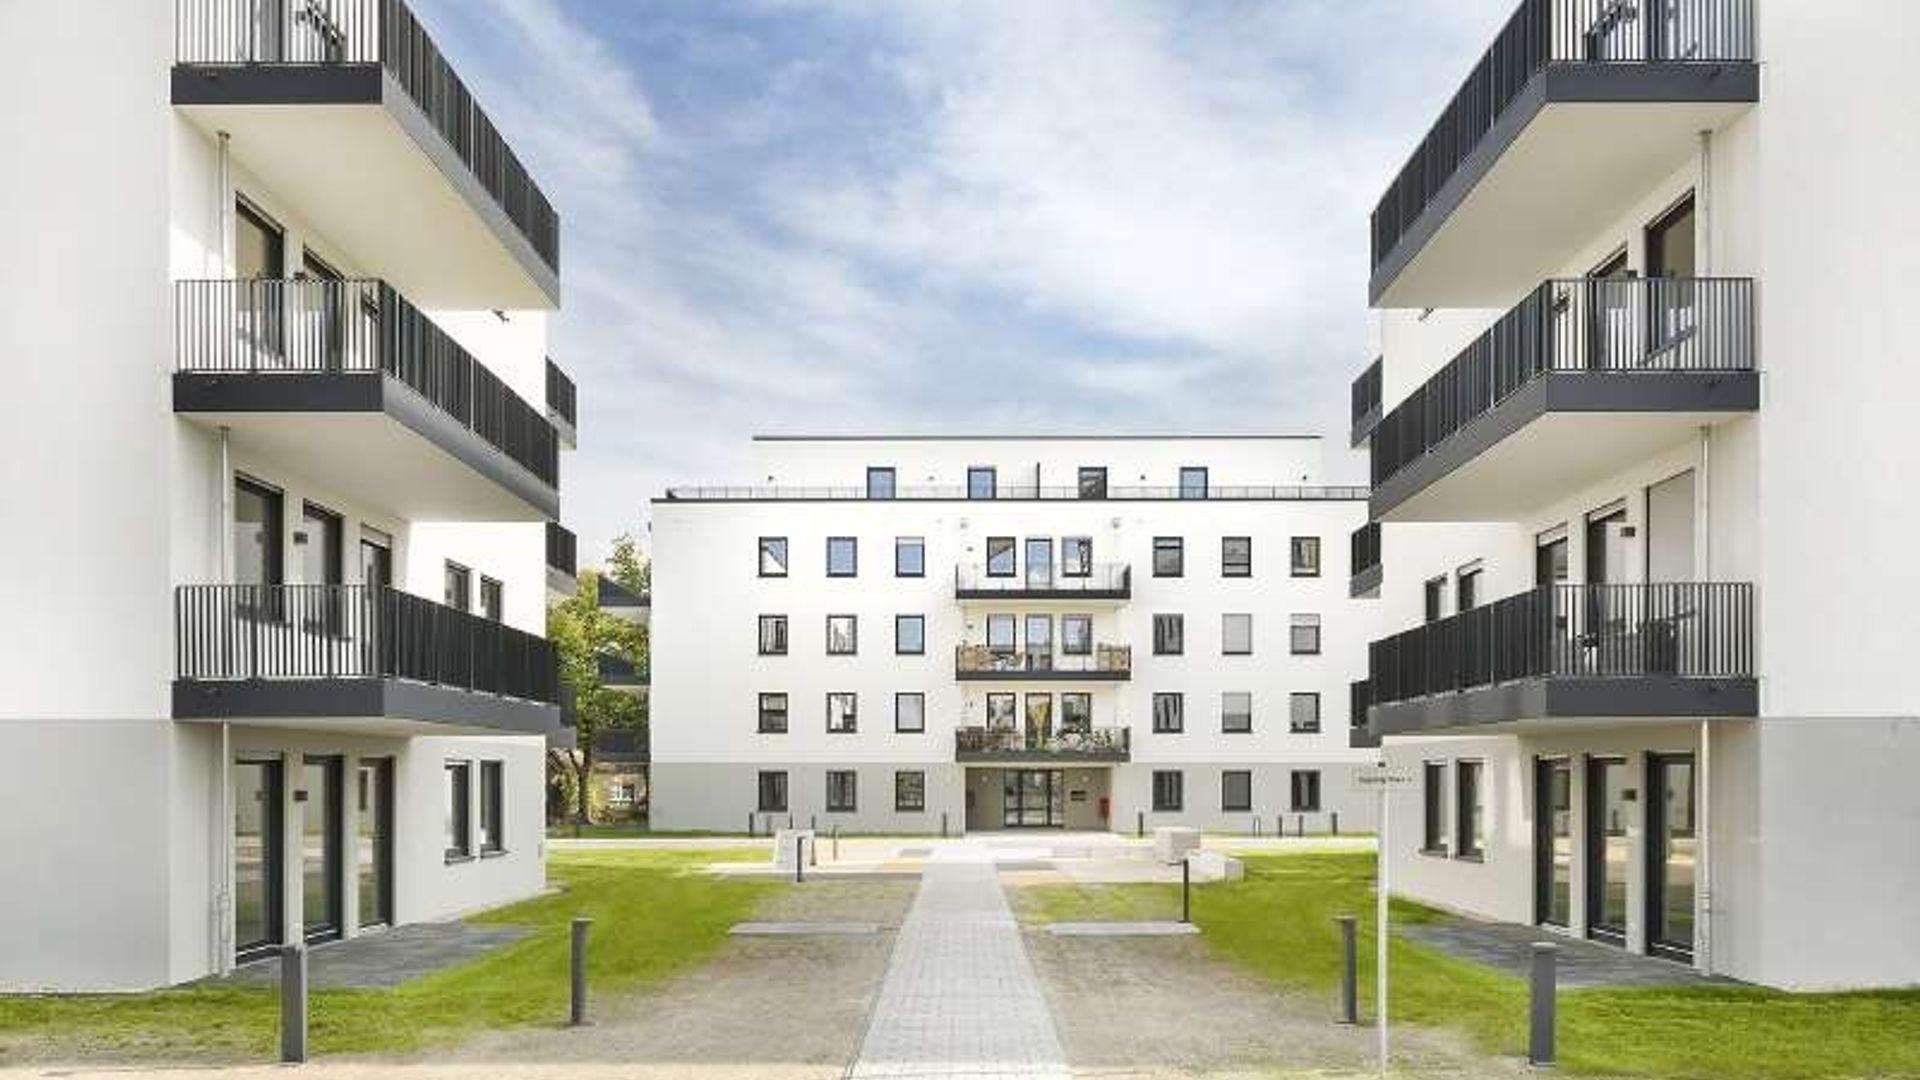 3 bedroom apartment at Rathausgasse, 12529 Schönefeld